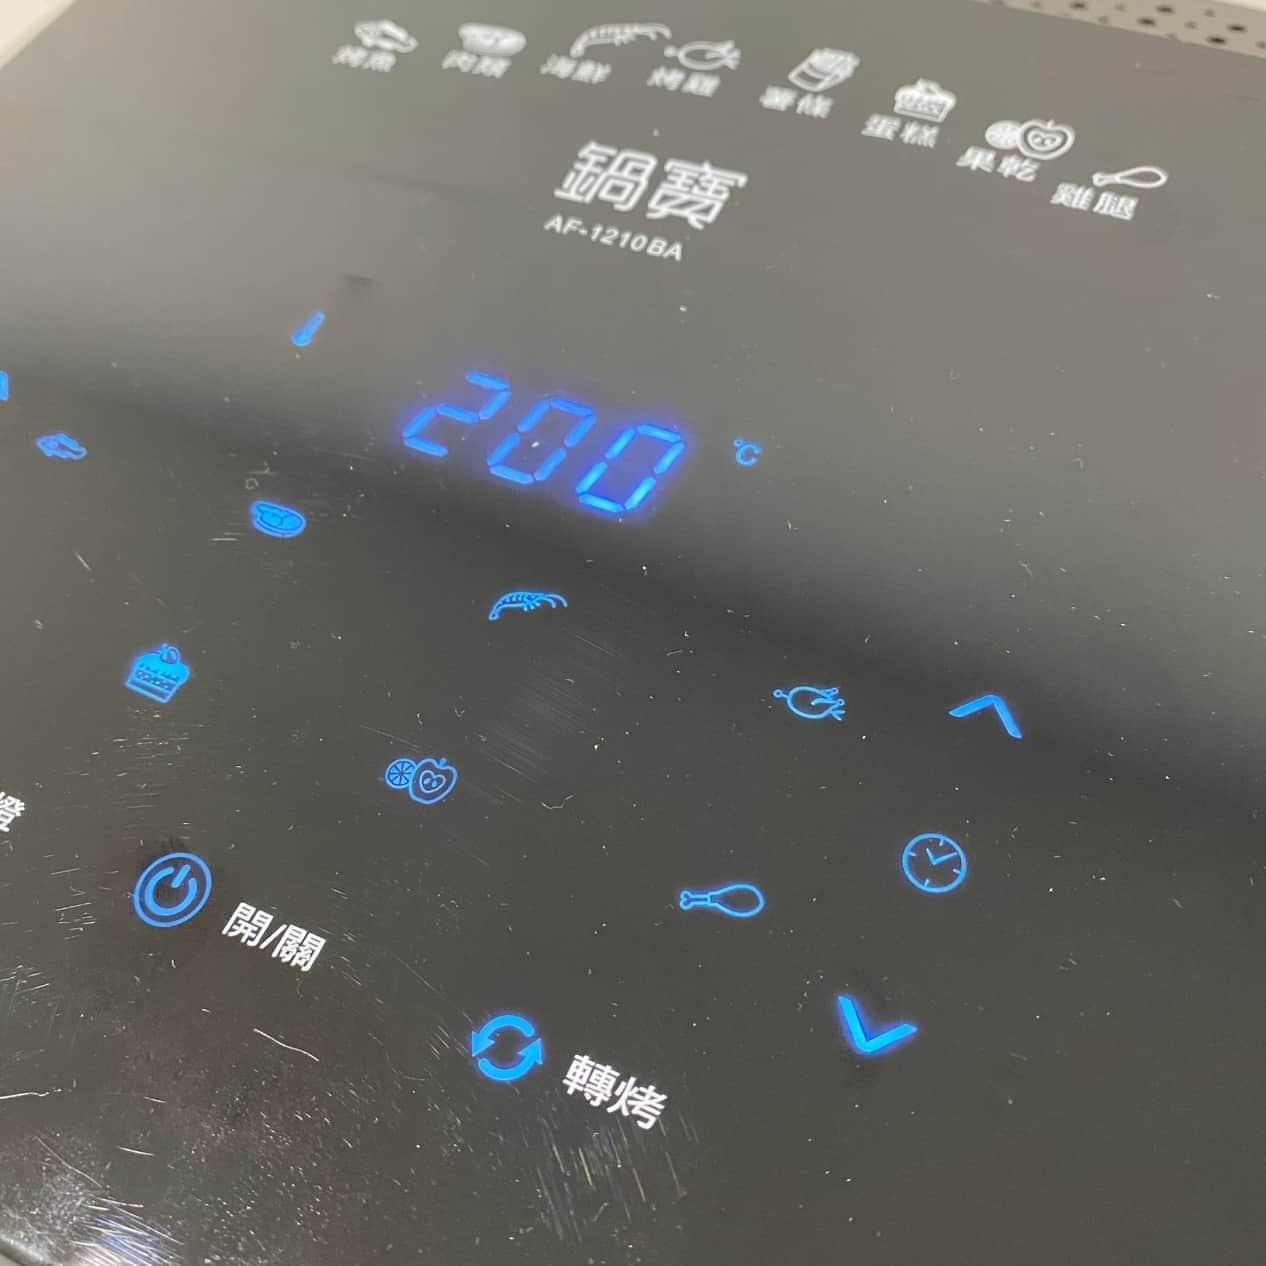 AF-1210BA 多功能氣炸烤箱-溫度可調40至200度